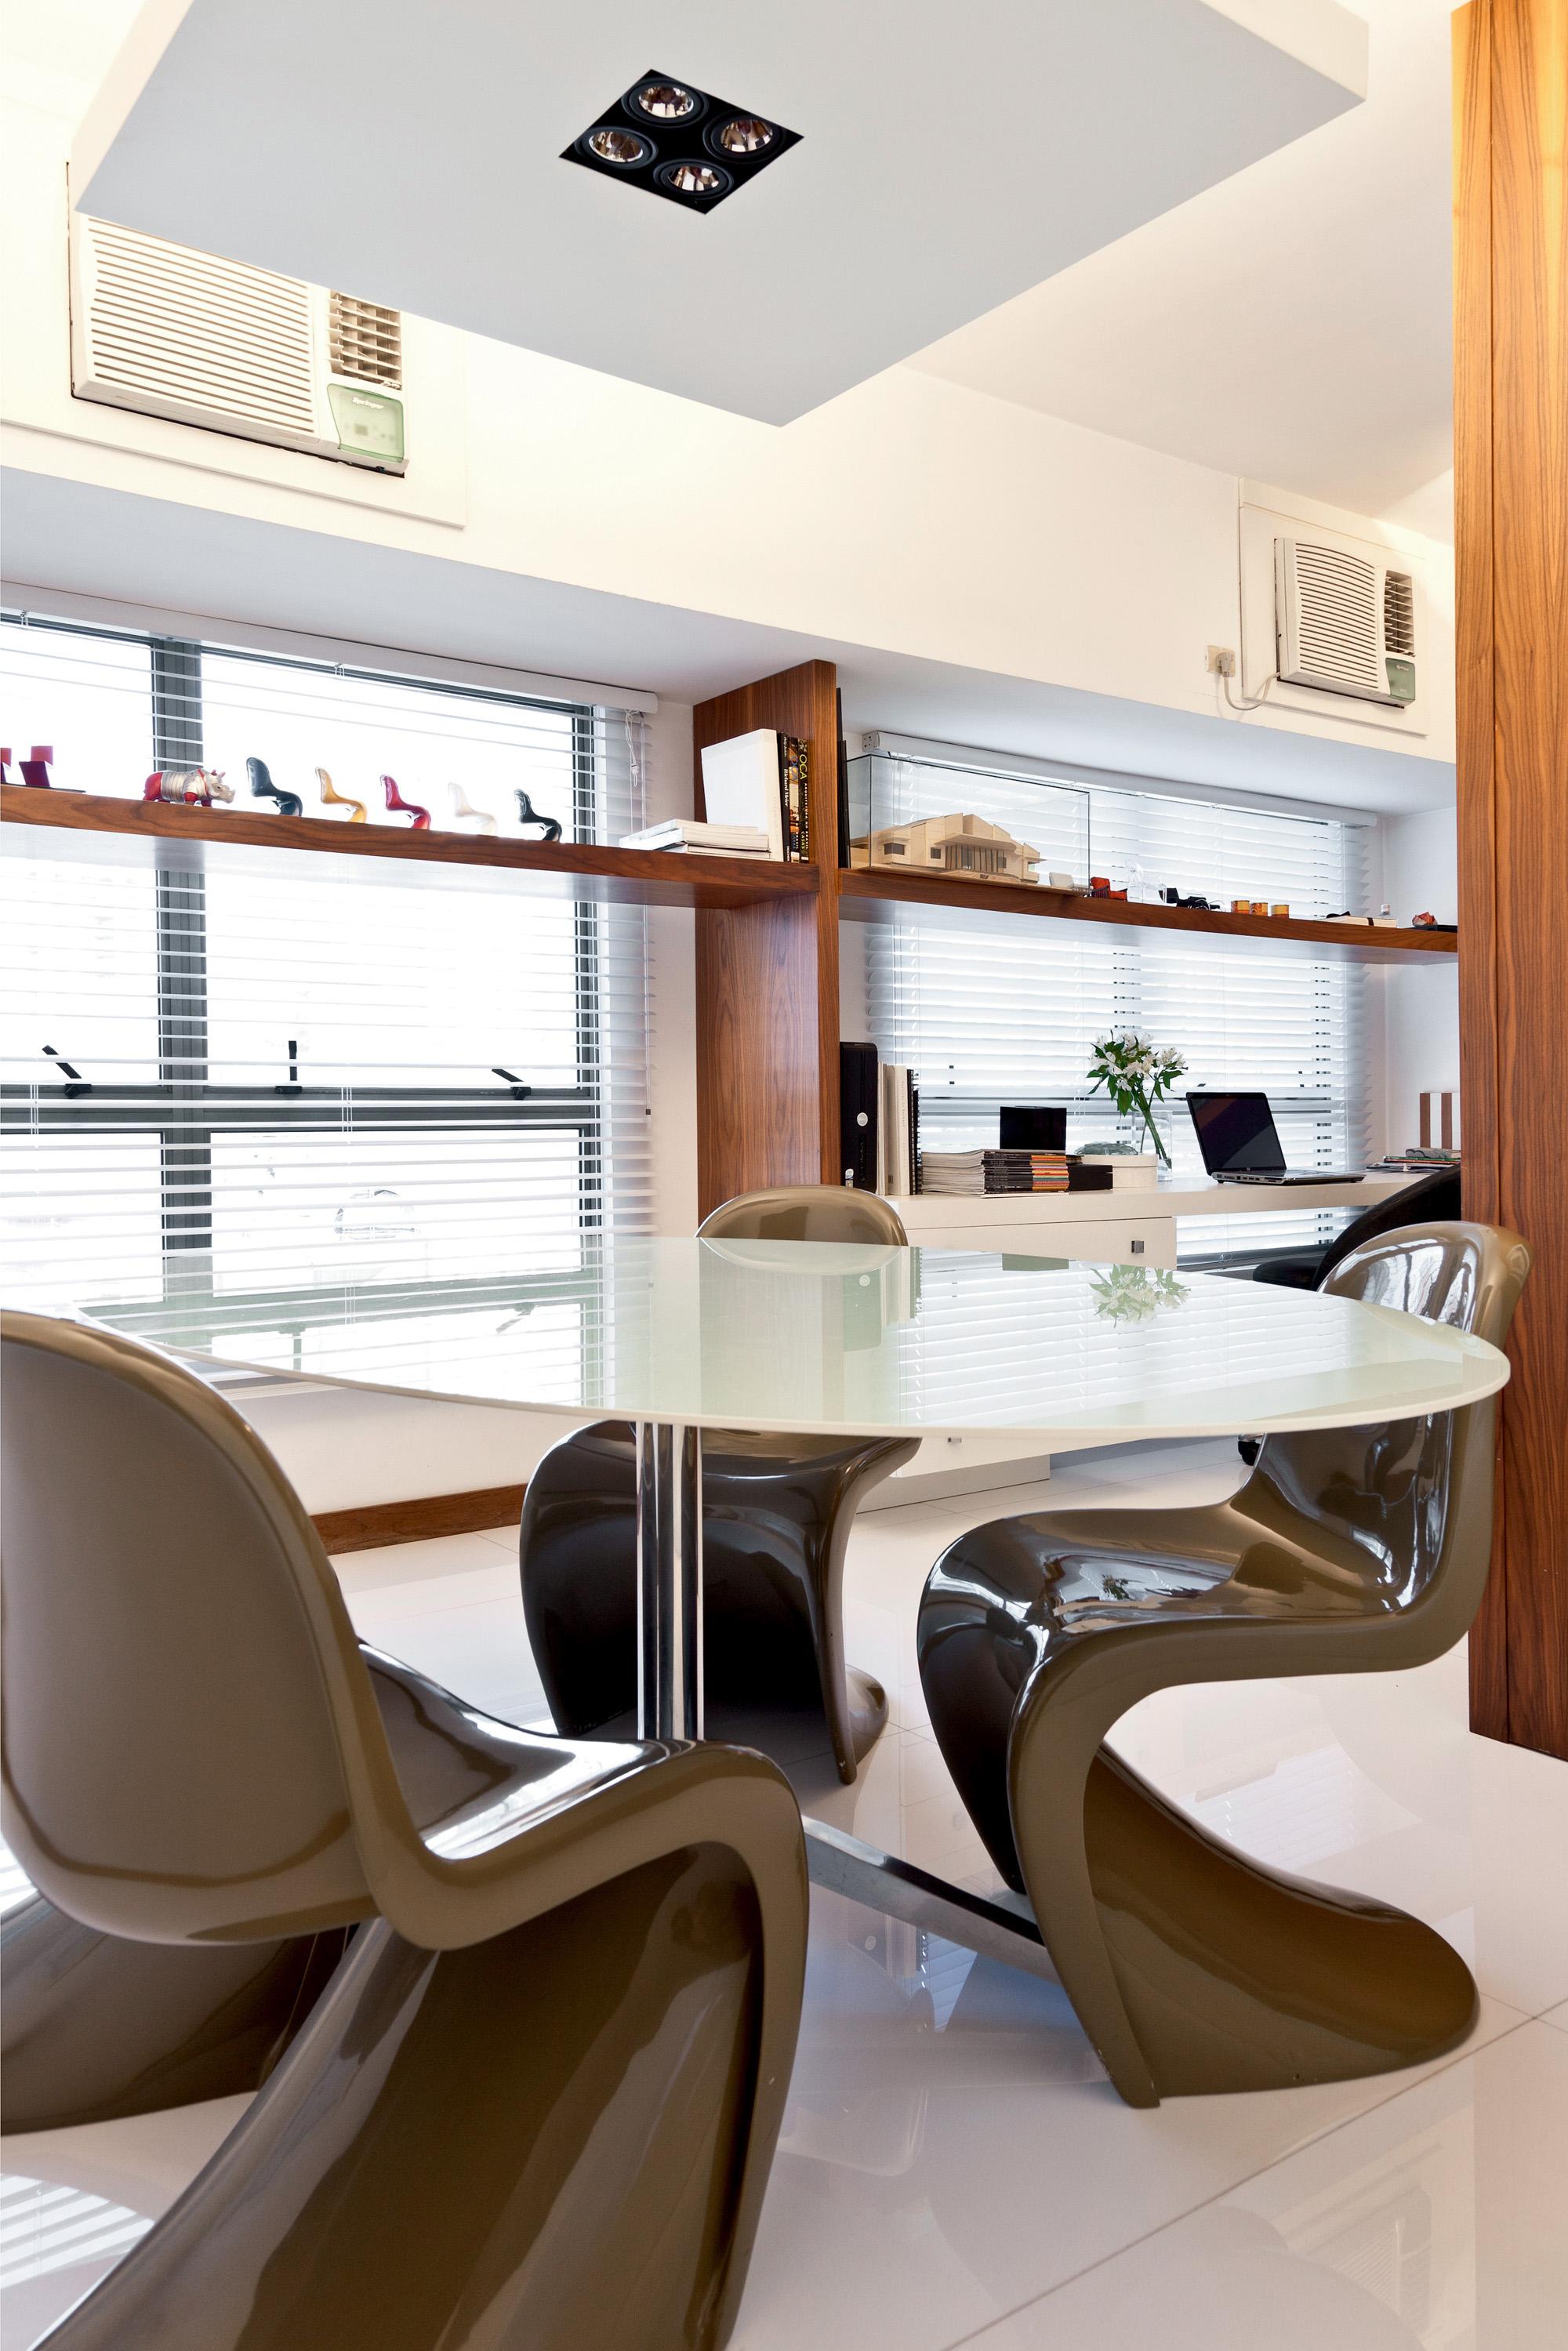 Escritório da arquiteta Karen Camilotti, mesa Knoll e cadeiras Panton.